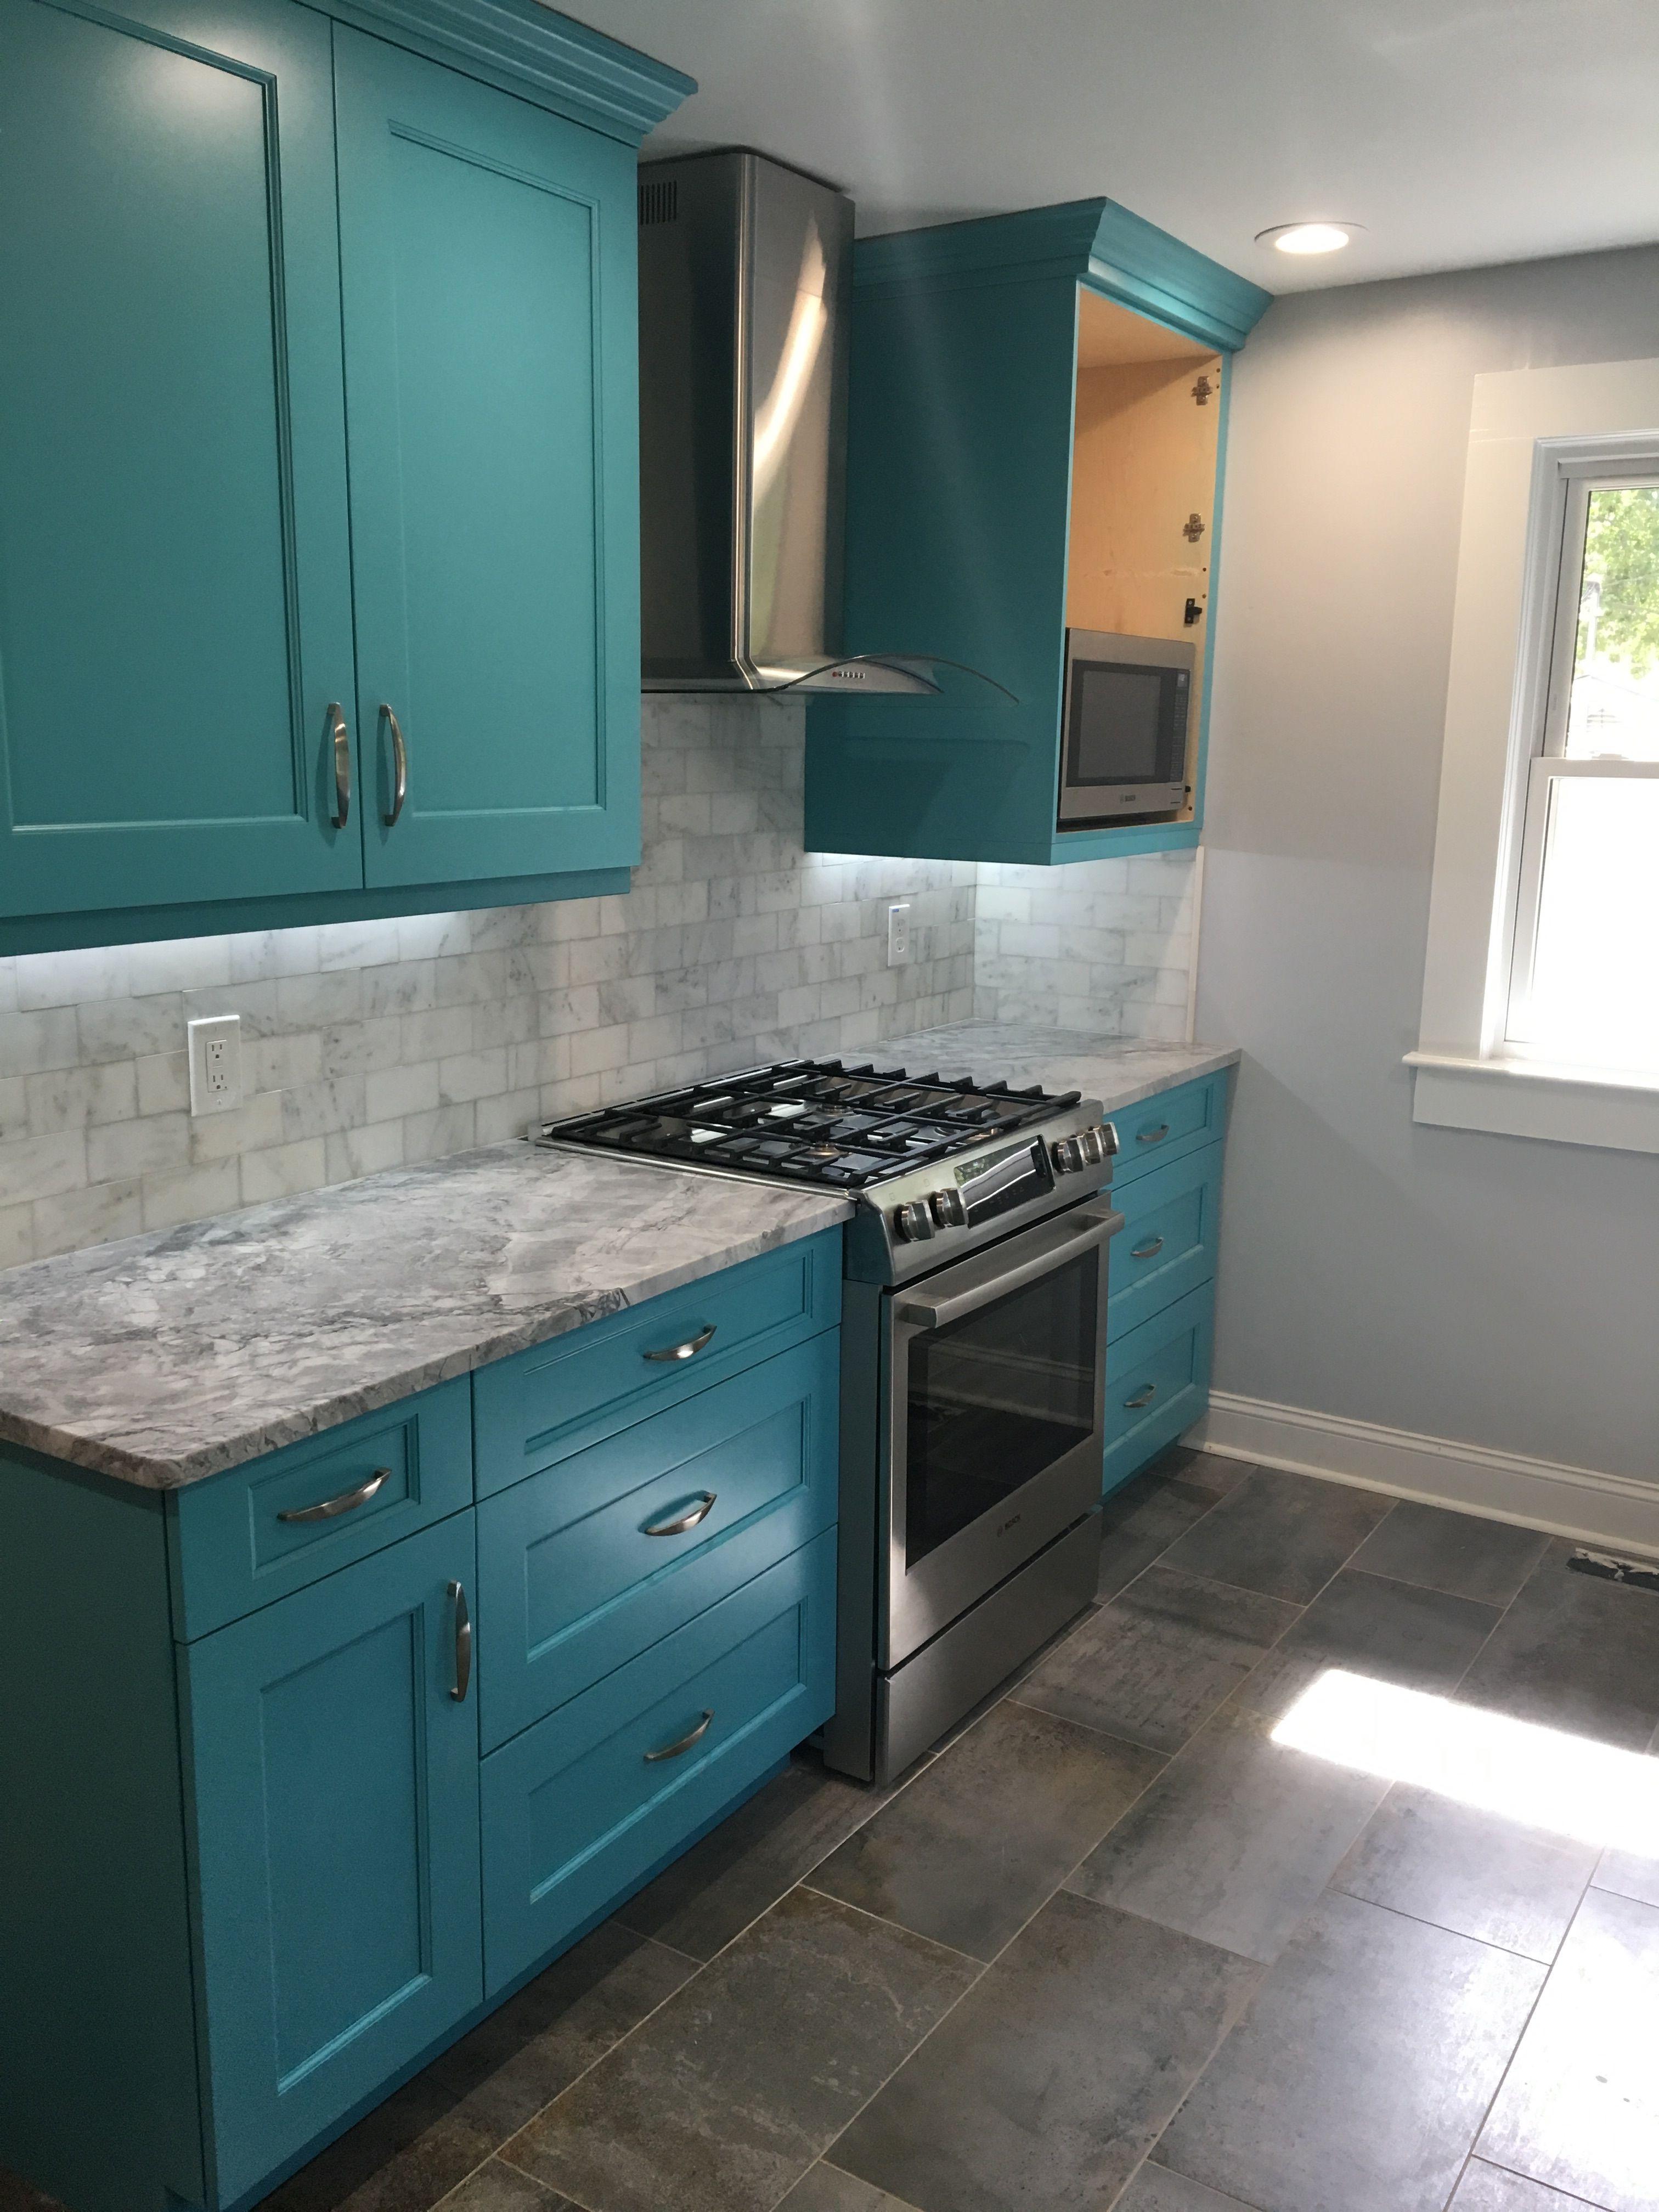 My Kitchen In The Making~ #kitchenremodel #turquoisecabinets #westasheville  #ncremodel #after #almost #granitecounters #Brandnewkitchen #AshevilleNC ...